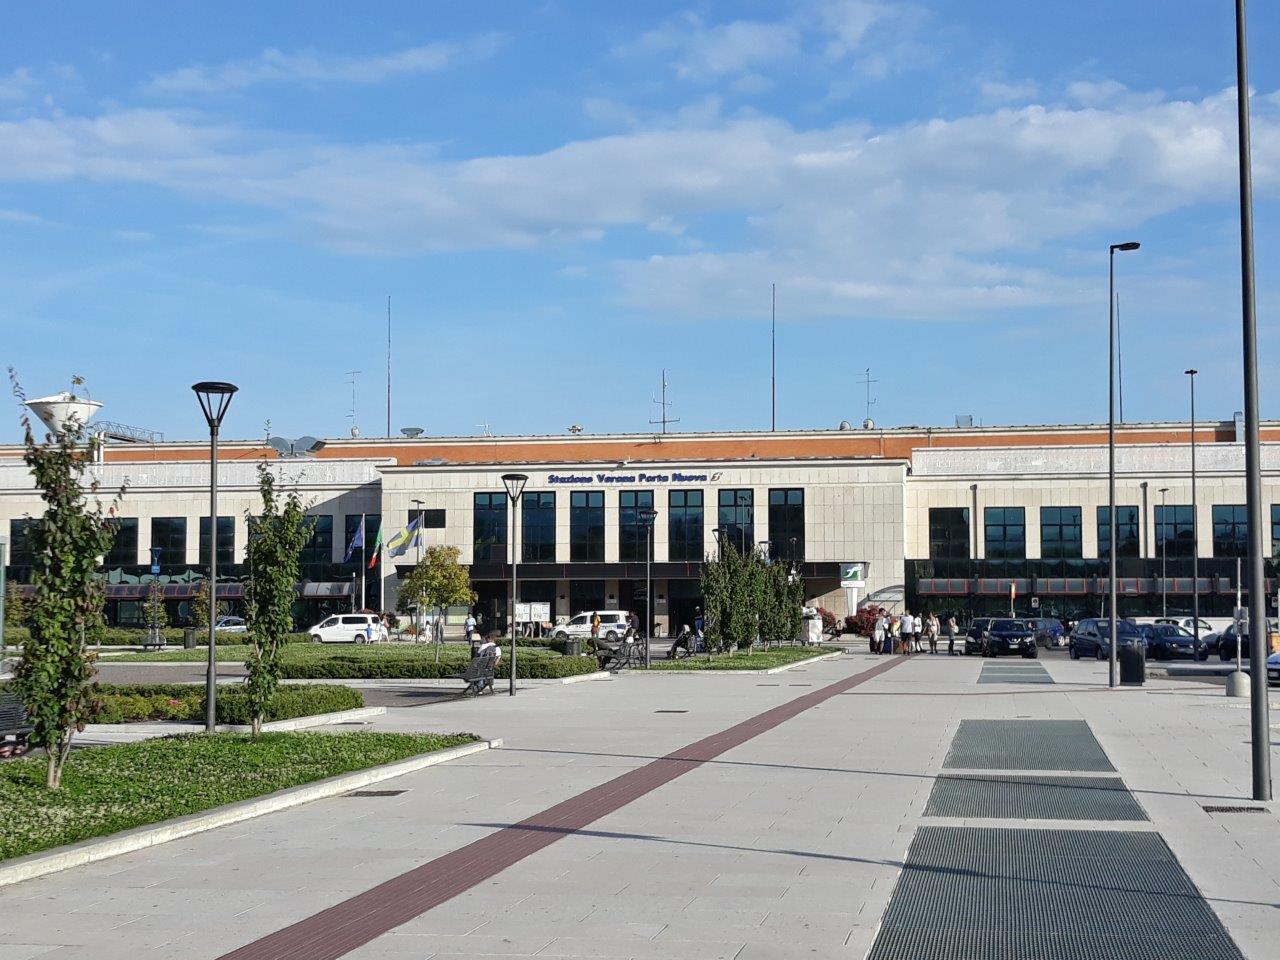 stazione-verona-porta-nuova-railway-station